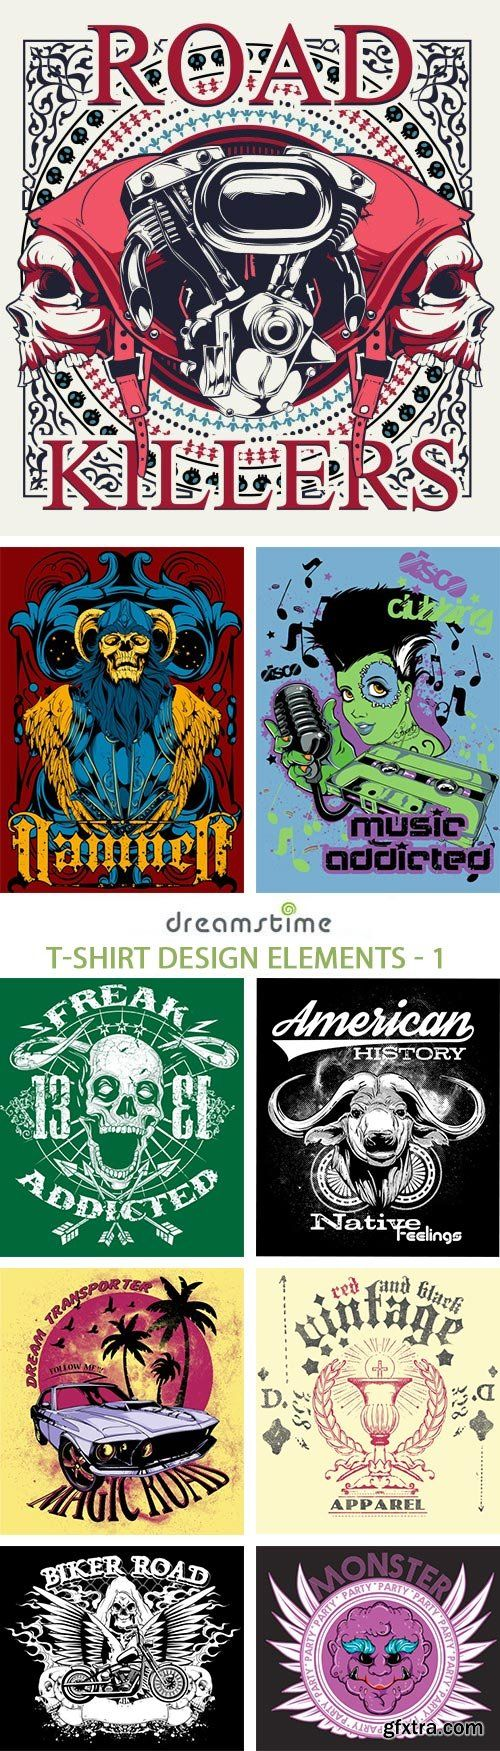 Shirt design elements - T Shirt Design Elements 1 25xeps